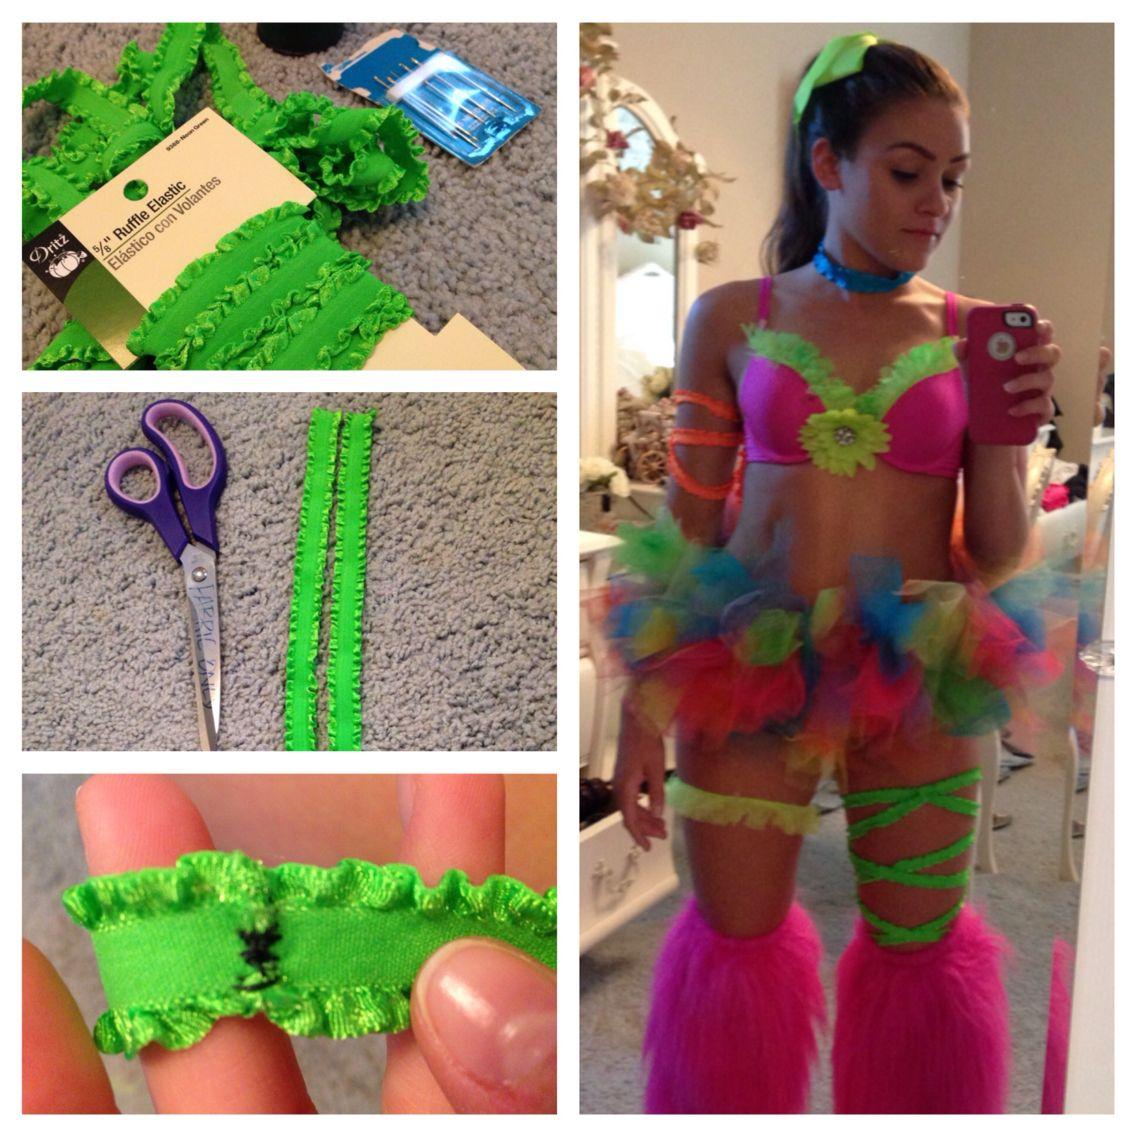 Purple Leg Wraps l Festival   Tights EDM Wear Leg Wraps Rave Clothing Thigh Wraps